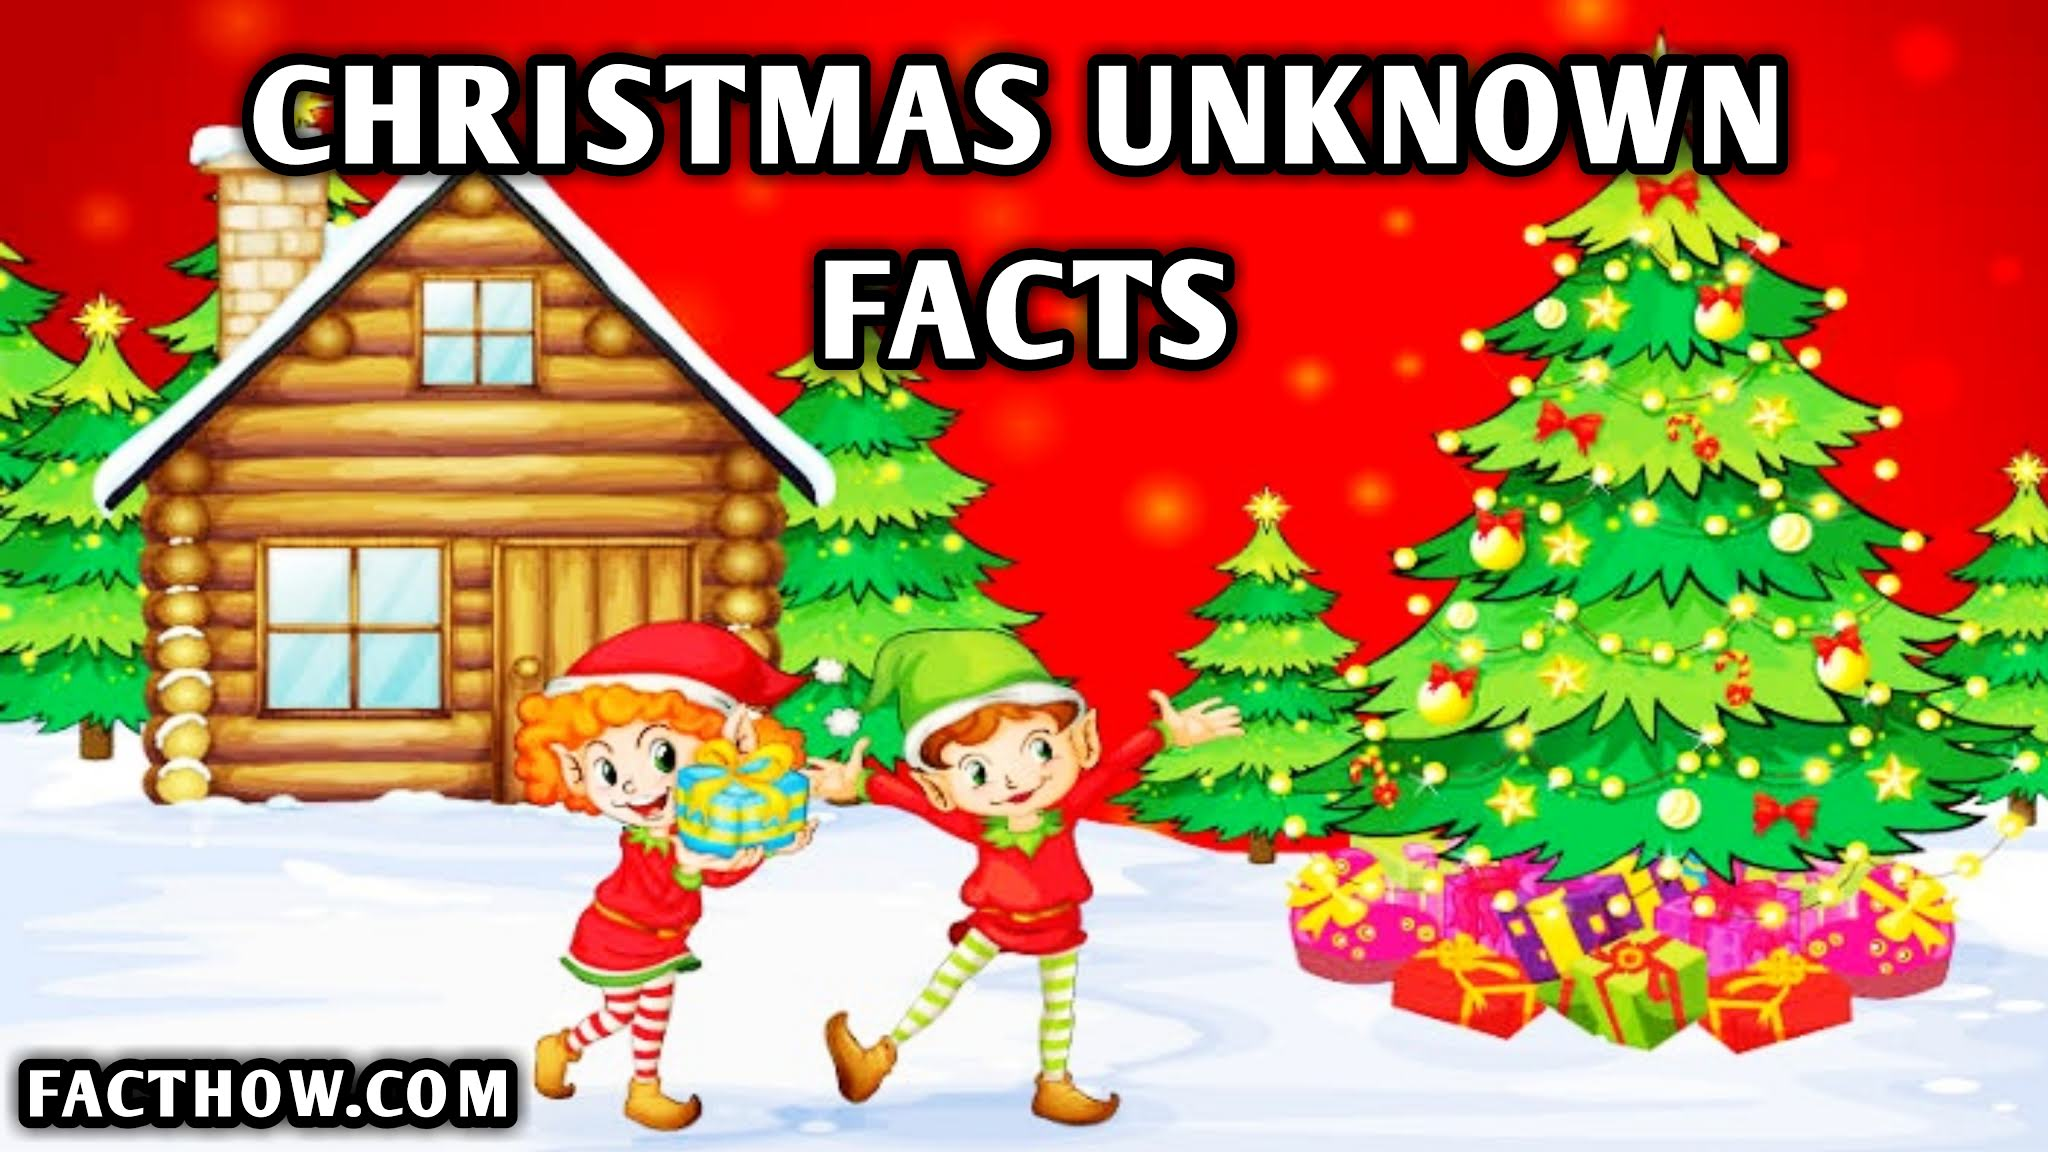 christmas-facts-hindi-christmas-song-movies-hindi-christmas-festival-santa-claus-reindeer-christmas-se-jude-ansune-rochak-tathya-christmas-unknown-facts-2020-christmas-movies-free-download-jingle-bells-fact-how-facthow